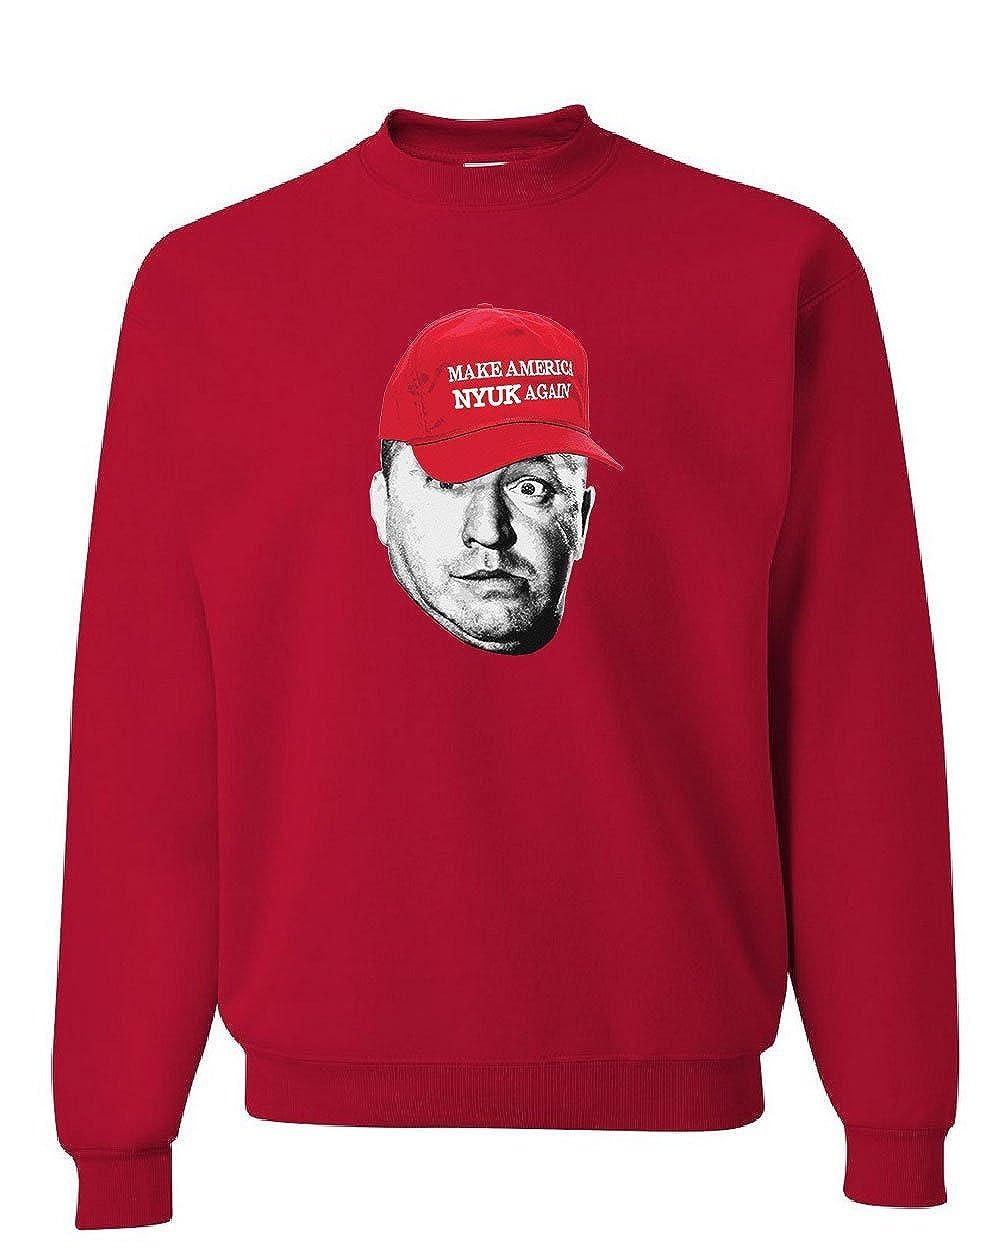 Make America Nyuk Again Sweatshirt The Three Stooges Comedy MAGA Sweater